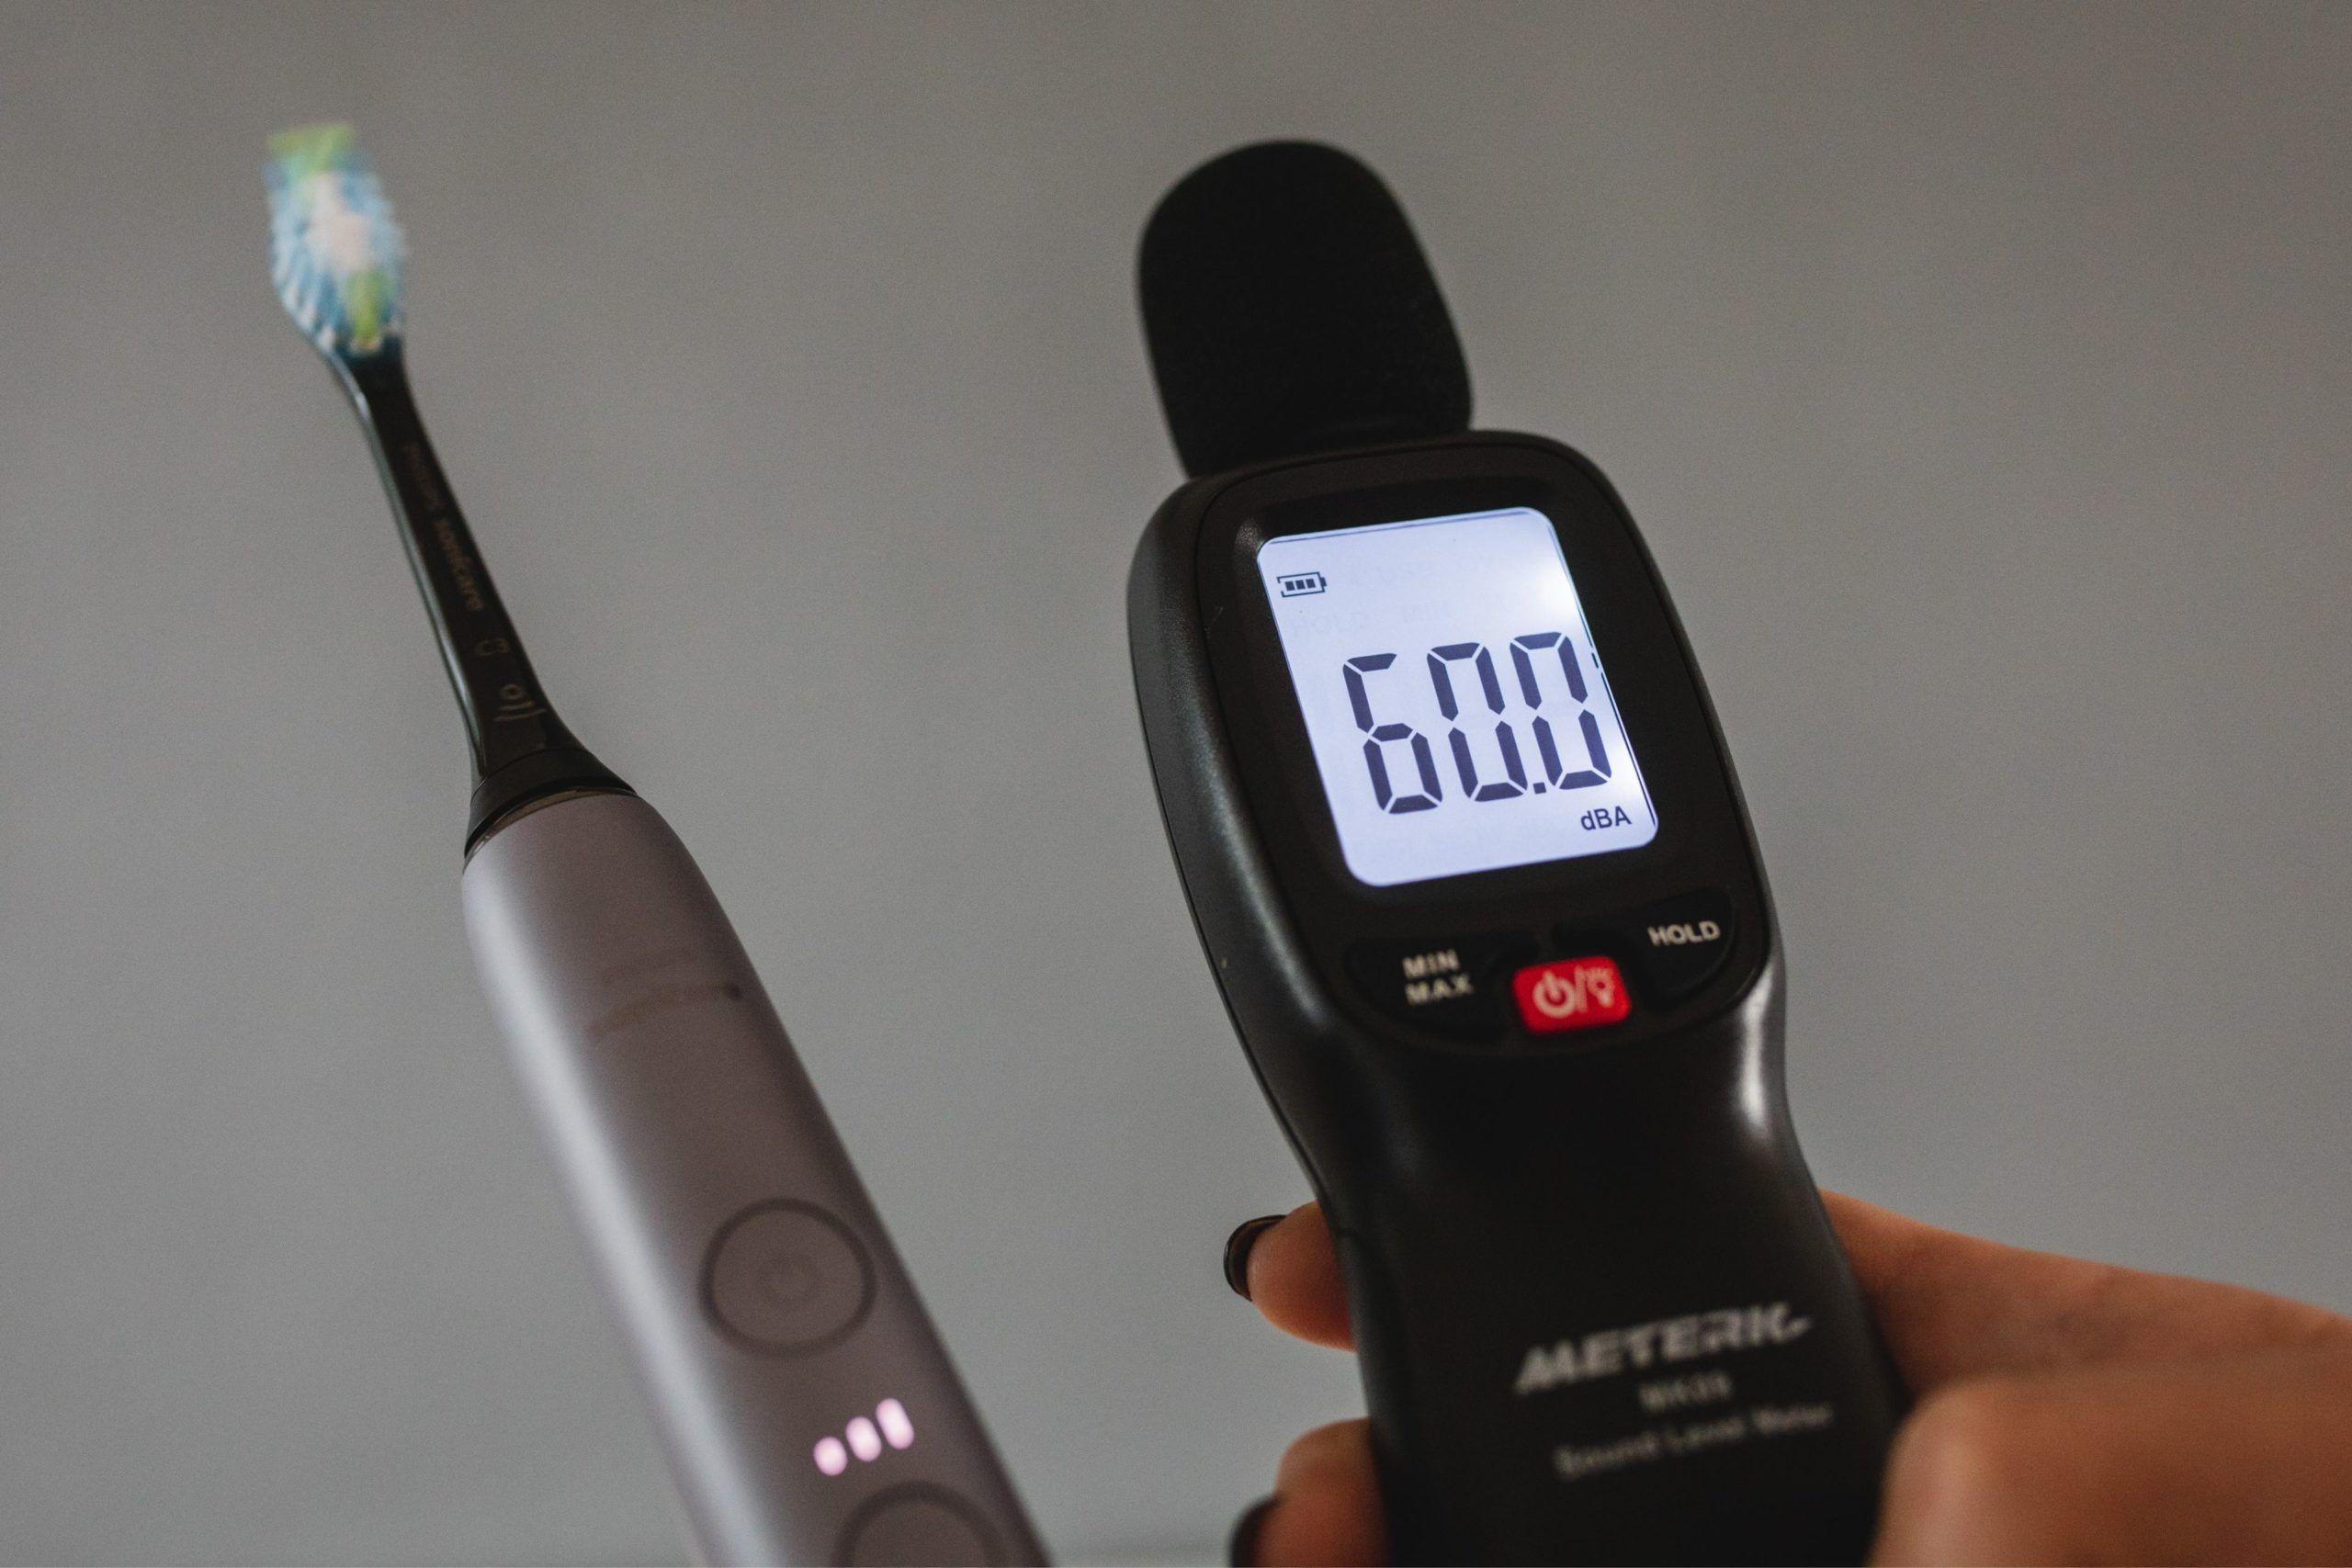 Eltandborste Philips Sonicare DiamondClean Smart ljudtest